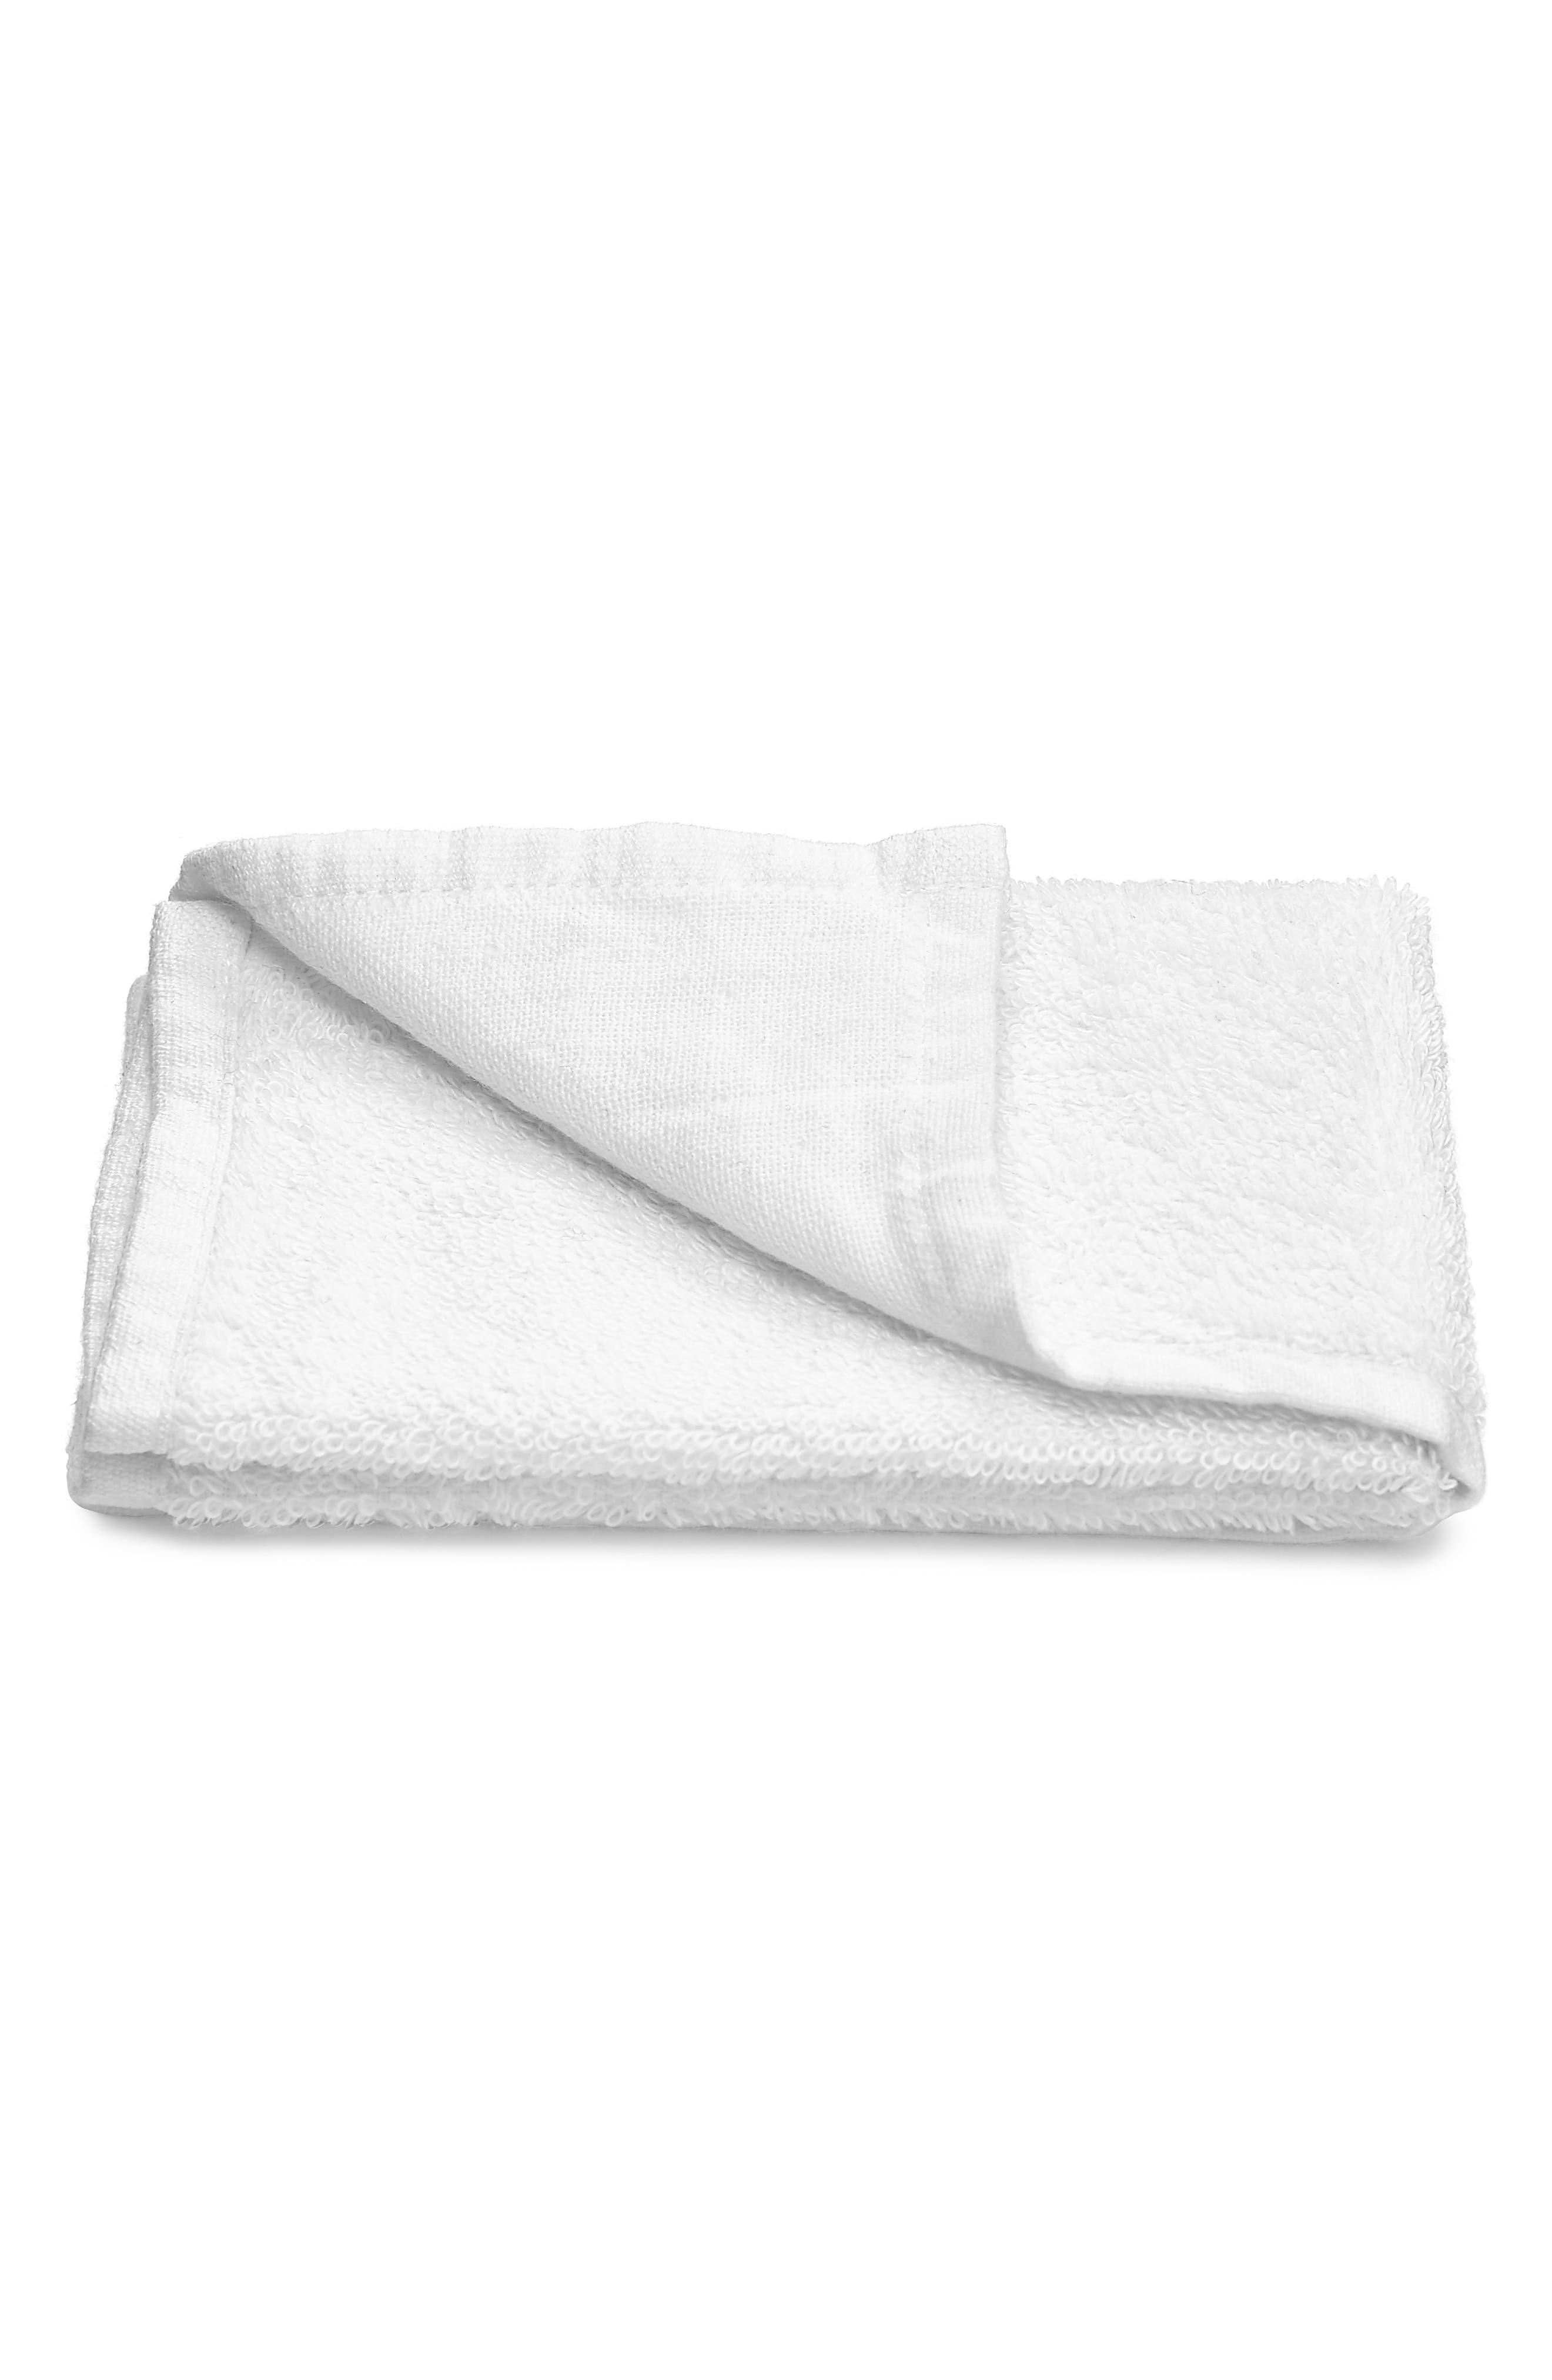 Set of 3 Washcloths,                             Alternate thumbnail 3, color,                             100